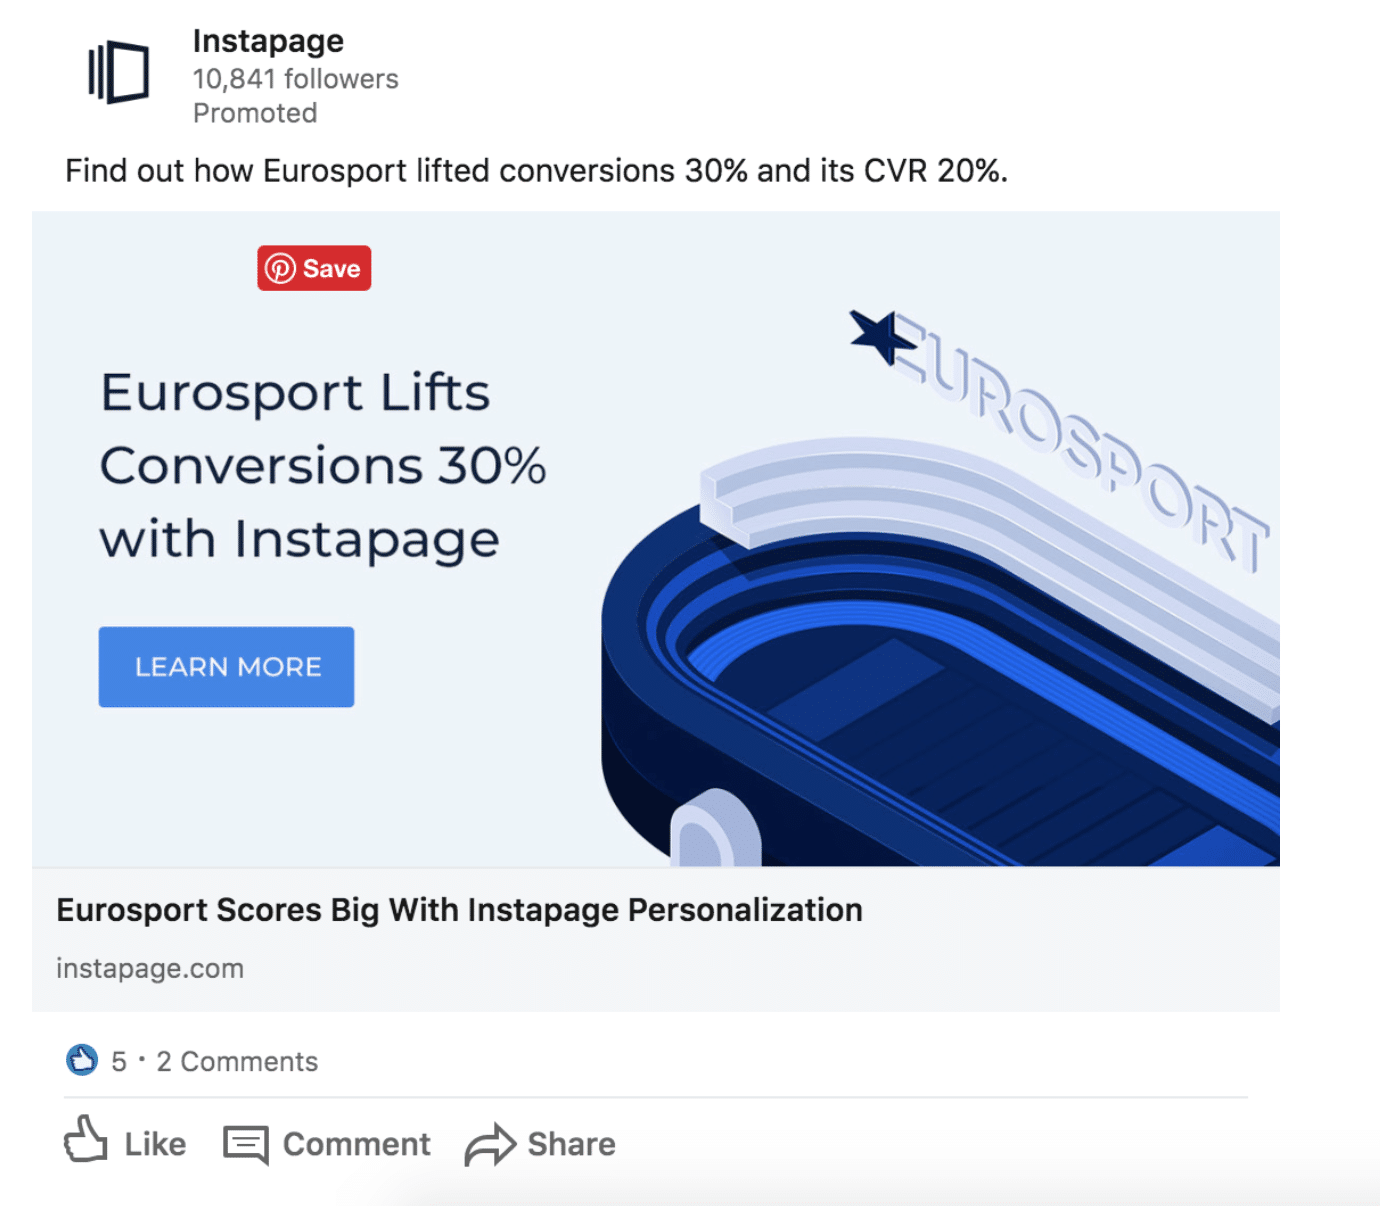 Instapage LinkedIn Ads